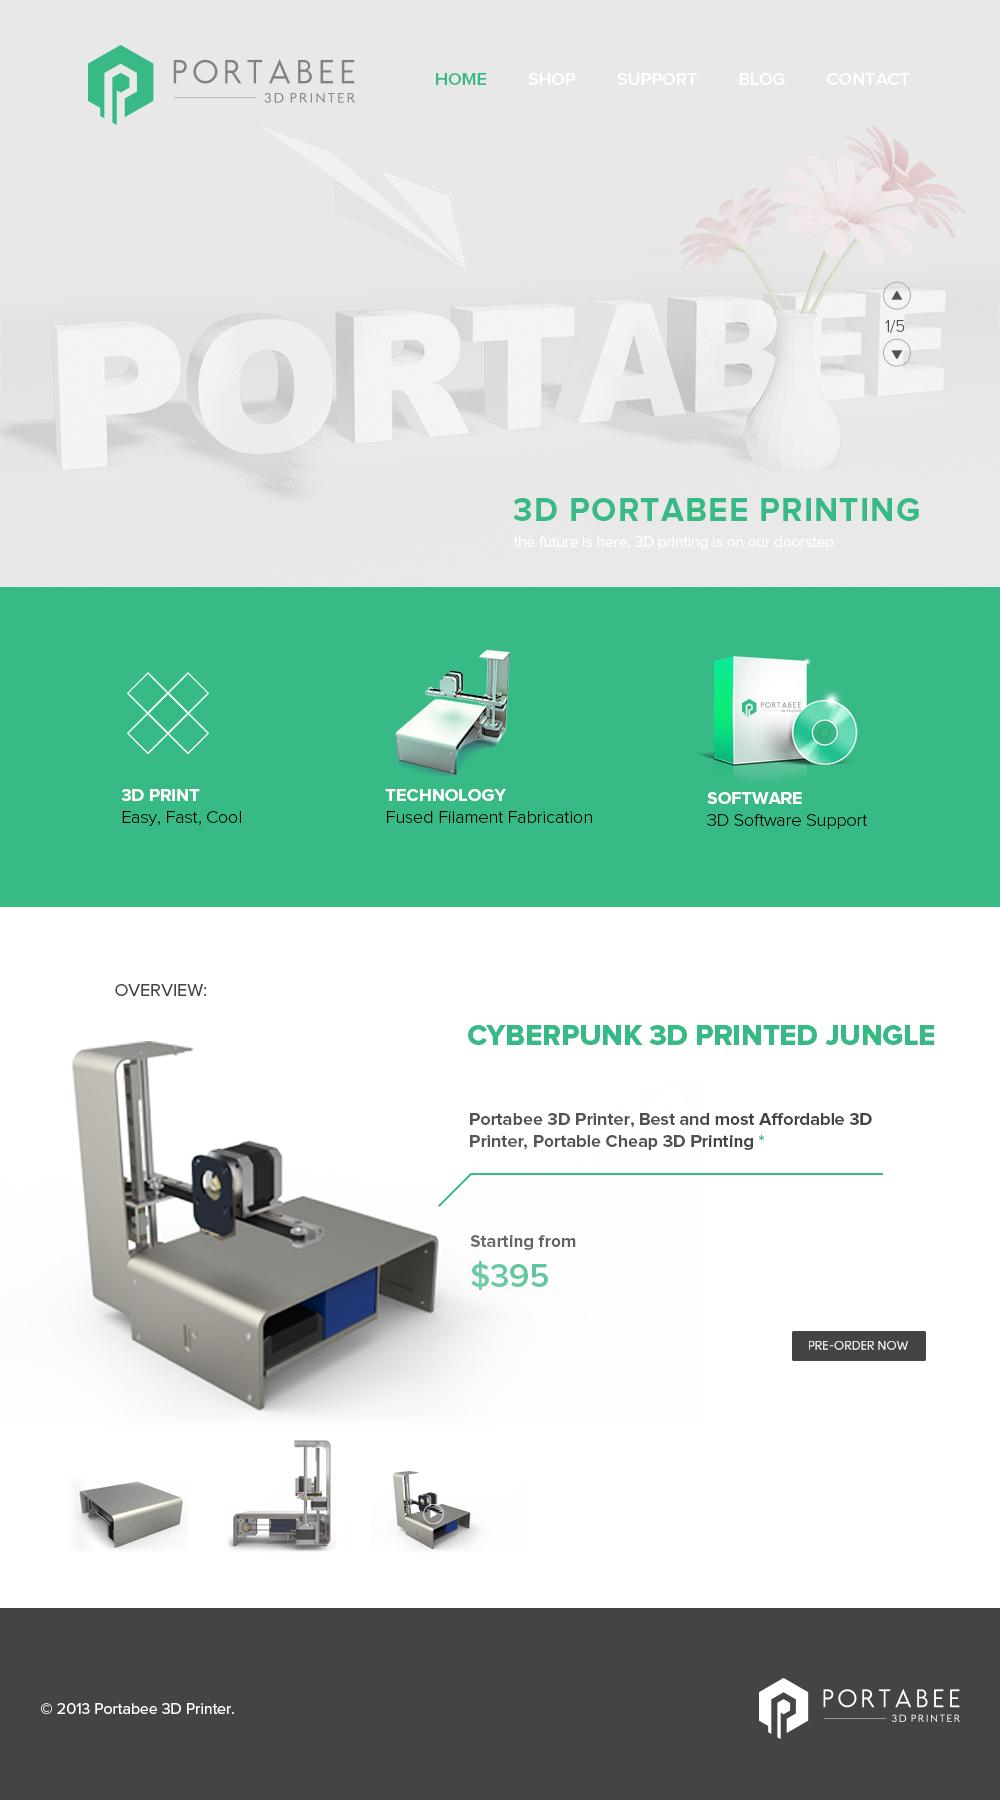 Portabee 3D Printer Portabee 3D printer